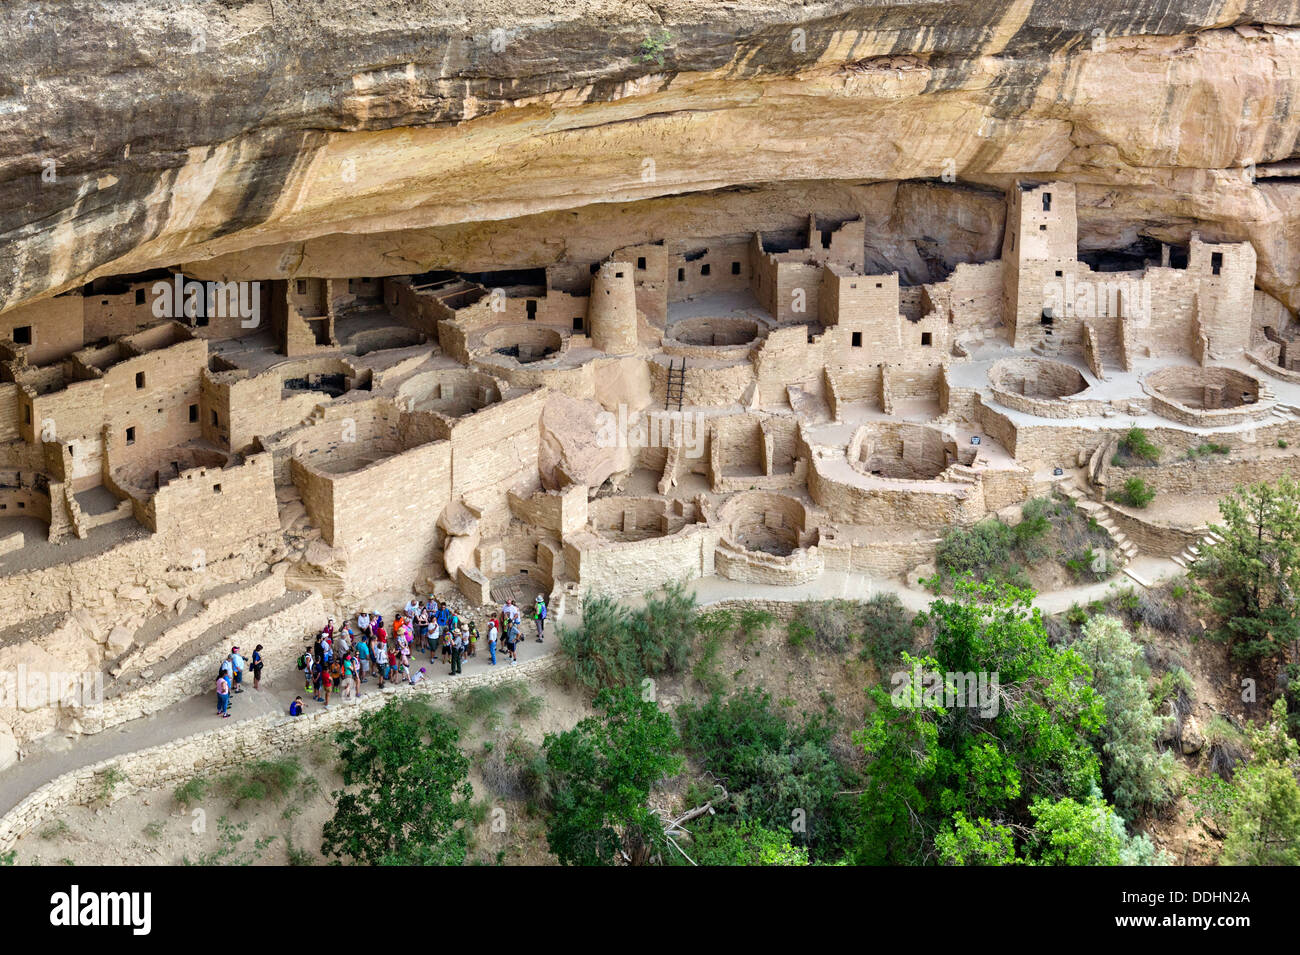 Group of tourists visiting the Cliff Palace, ancient Anasazi pueblo dwellings, Mesa Verde National Park, Cortez, USA - Stock Image